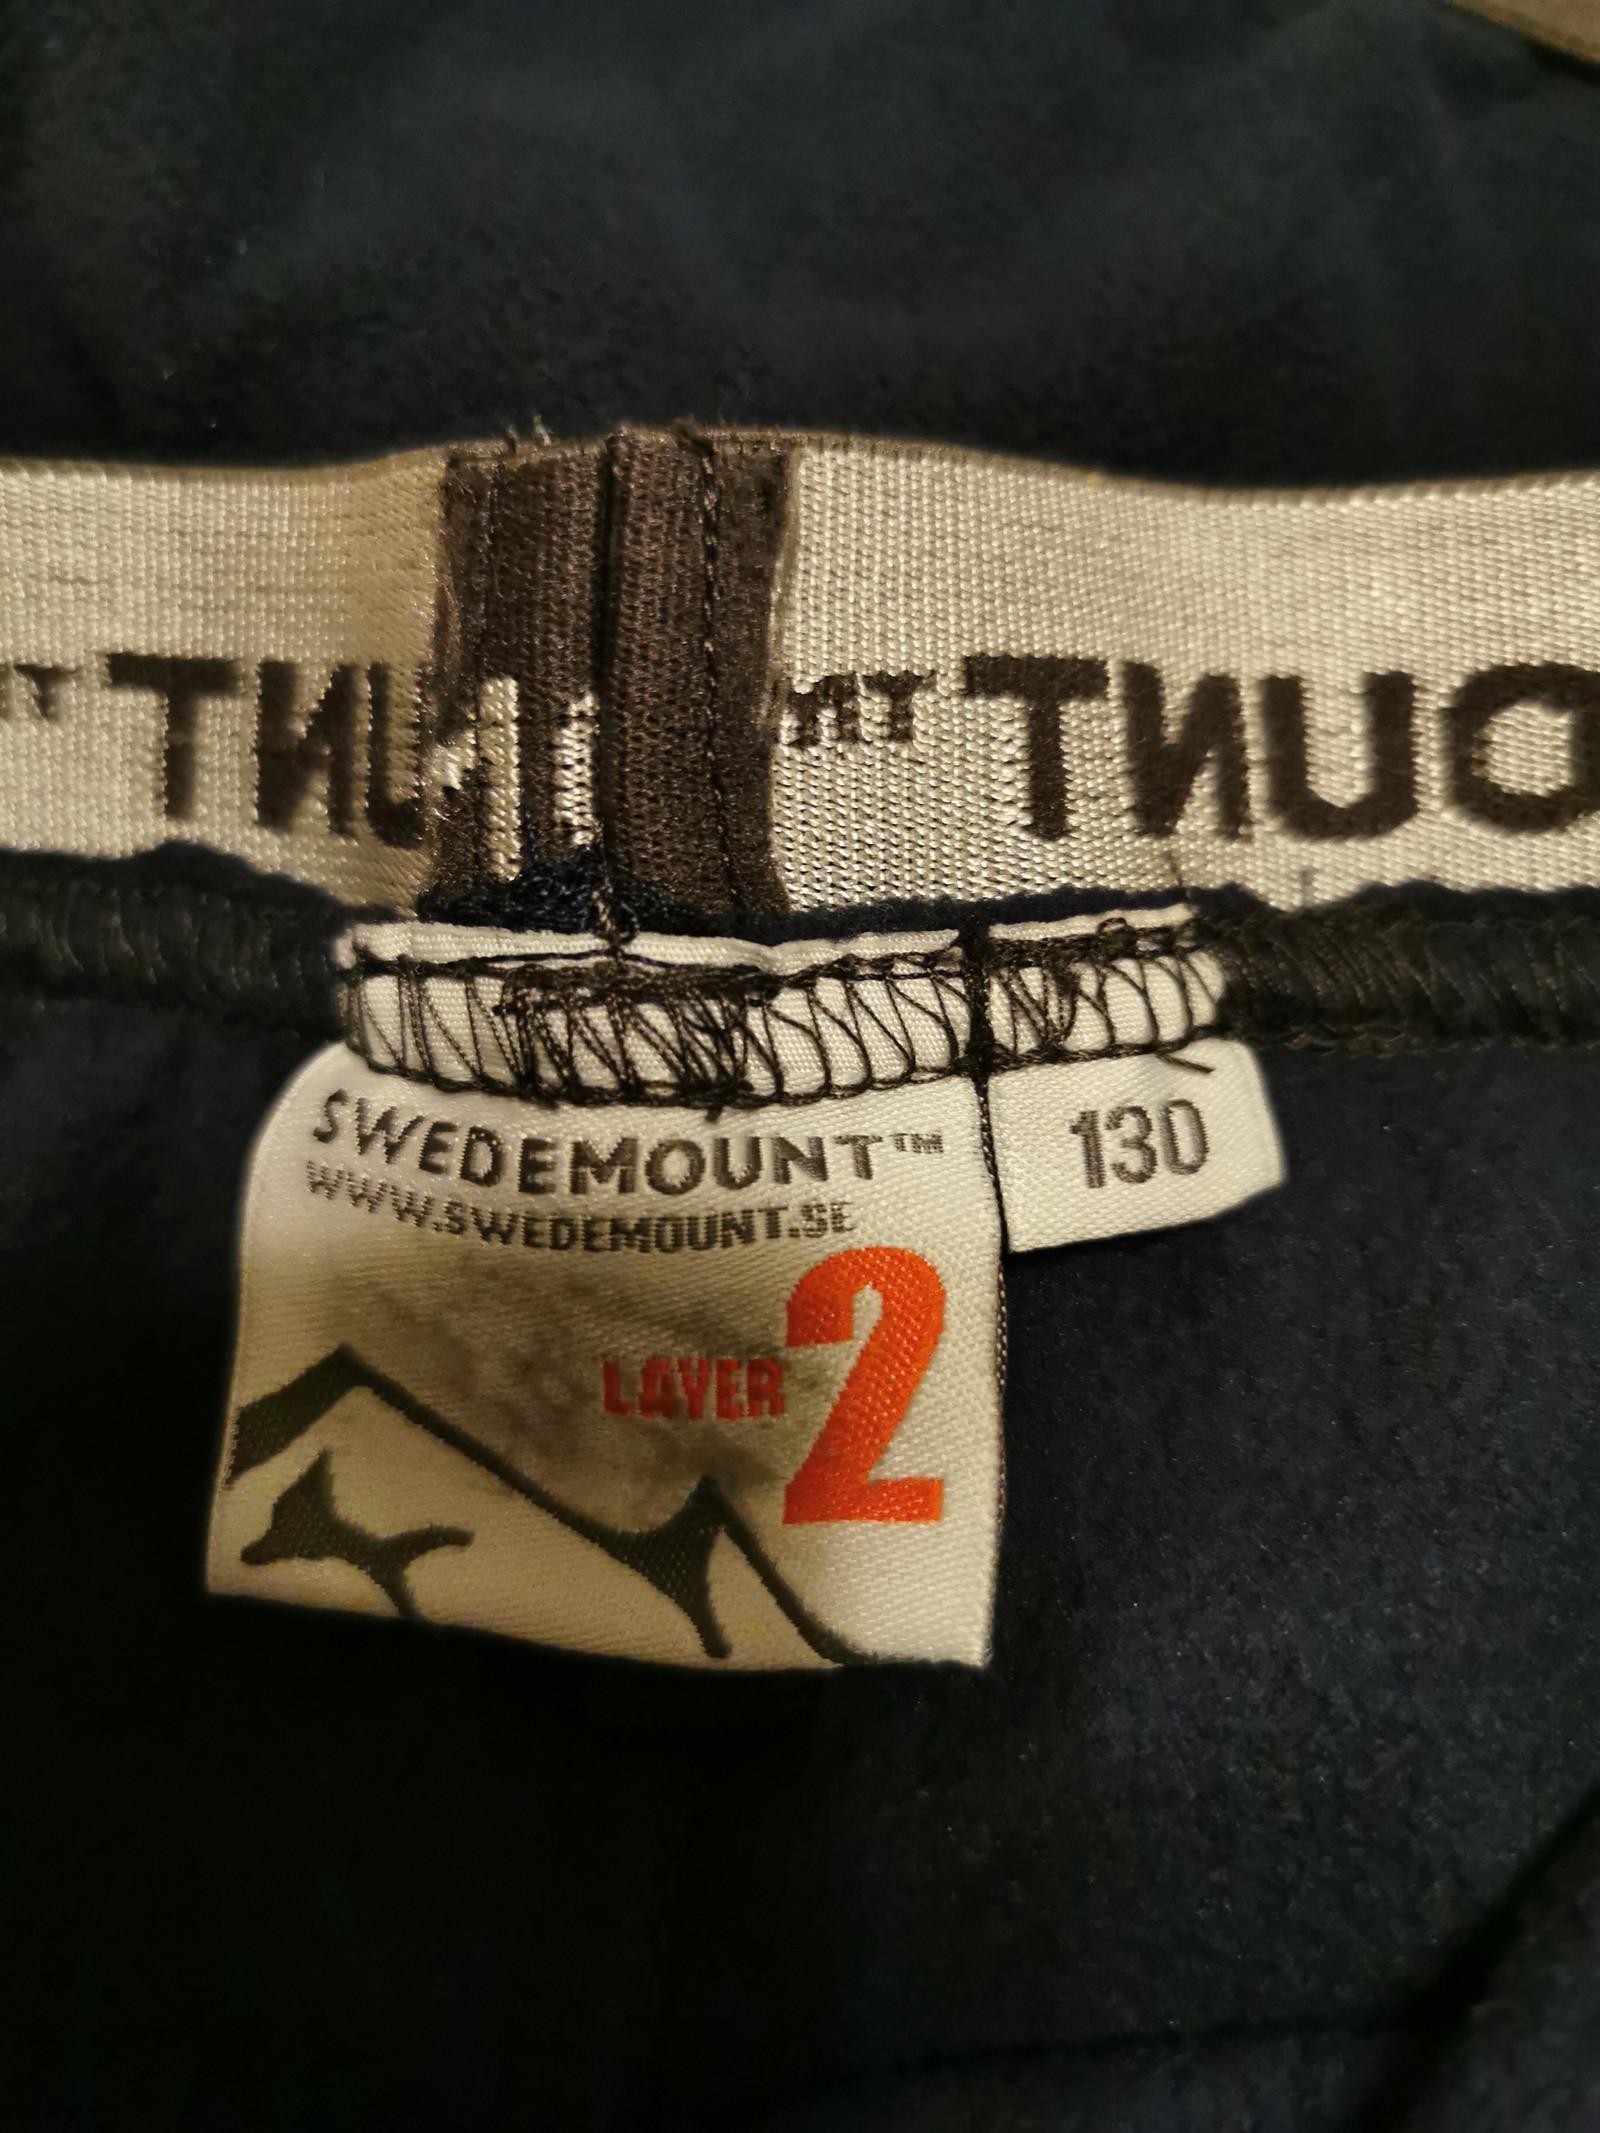 2 stk Swedemount fleece bukser str 130   FINN.no